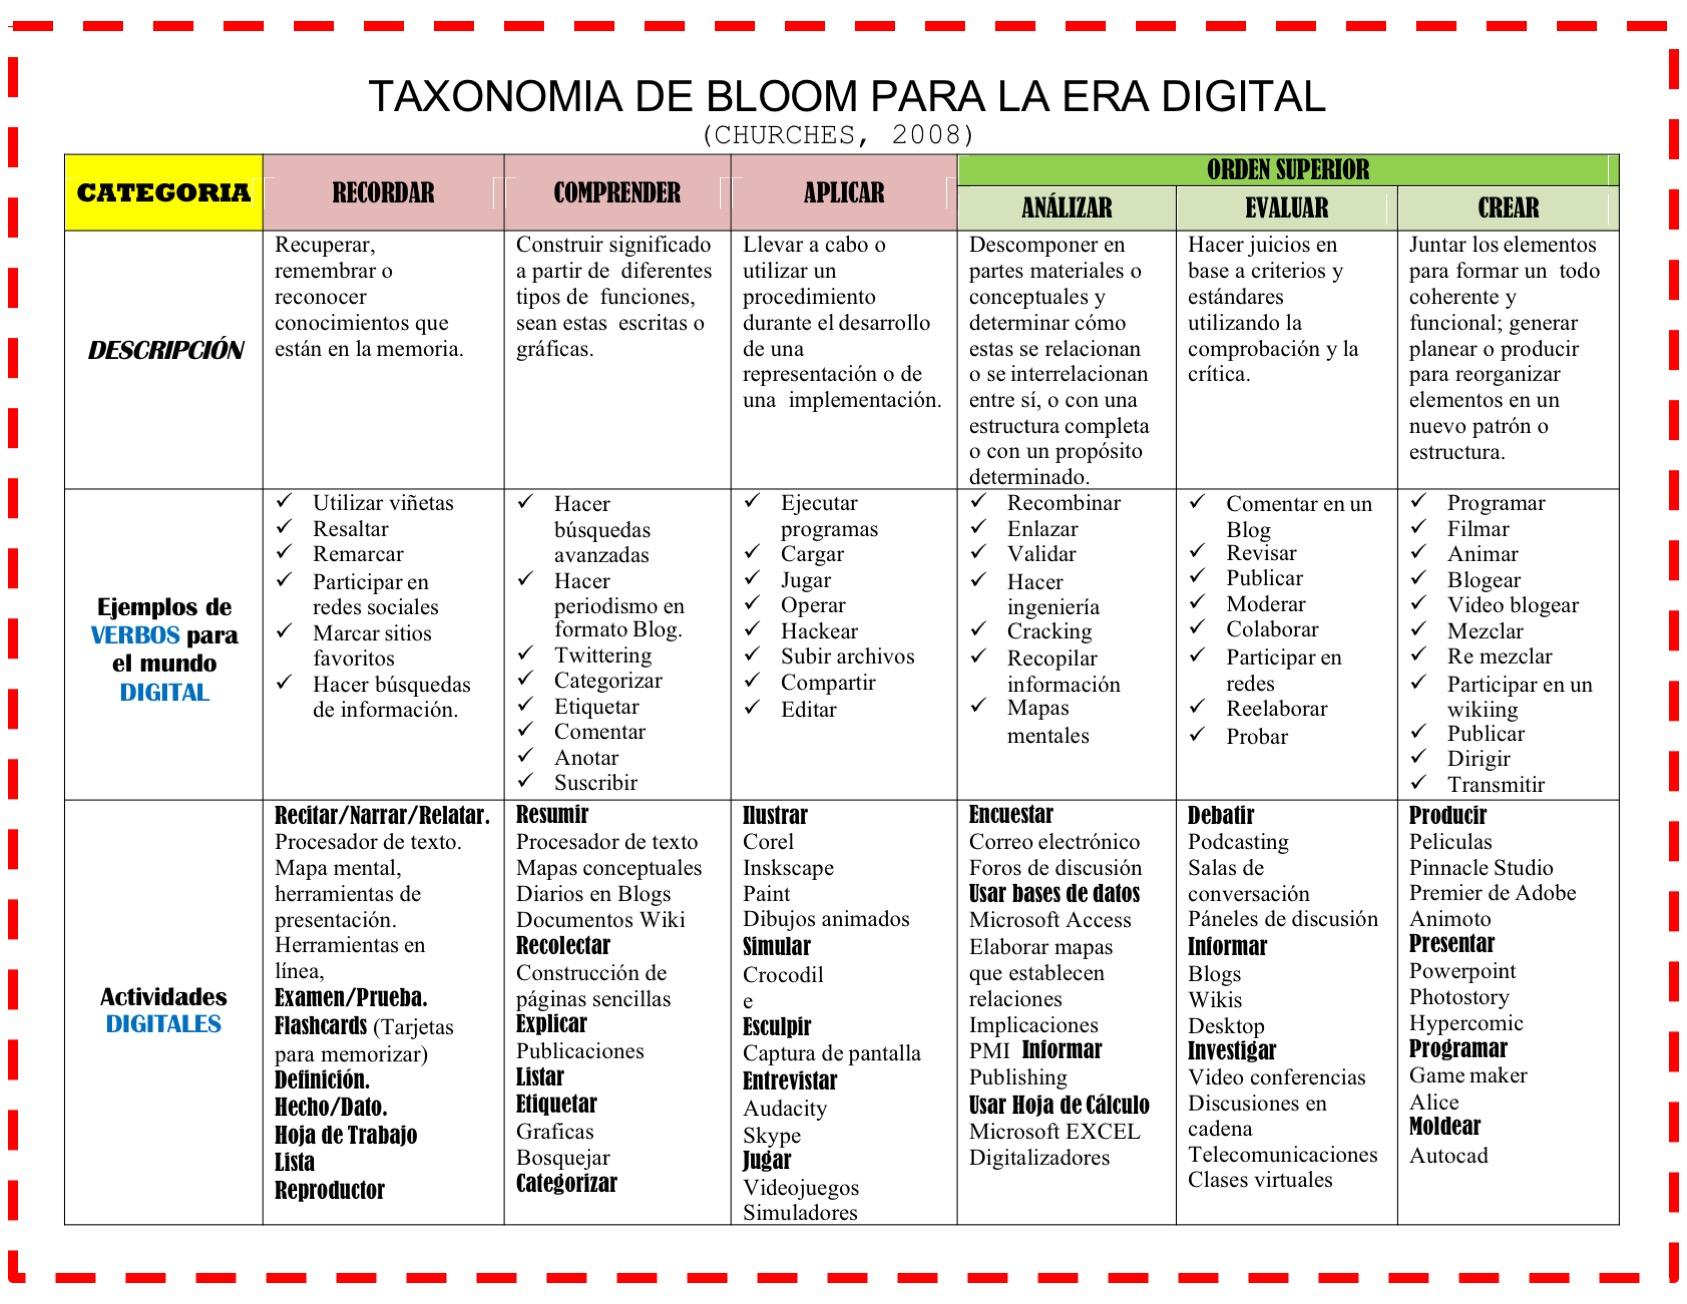 TAXONOMIA DE BLOOM TABLA EPUB DOWNLOAD